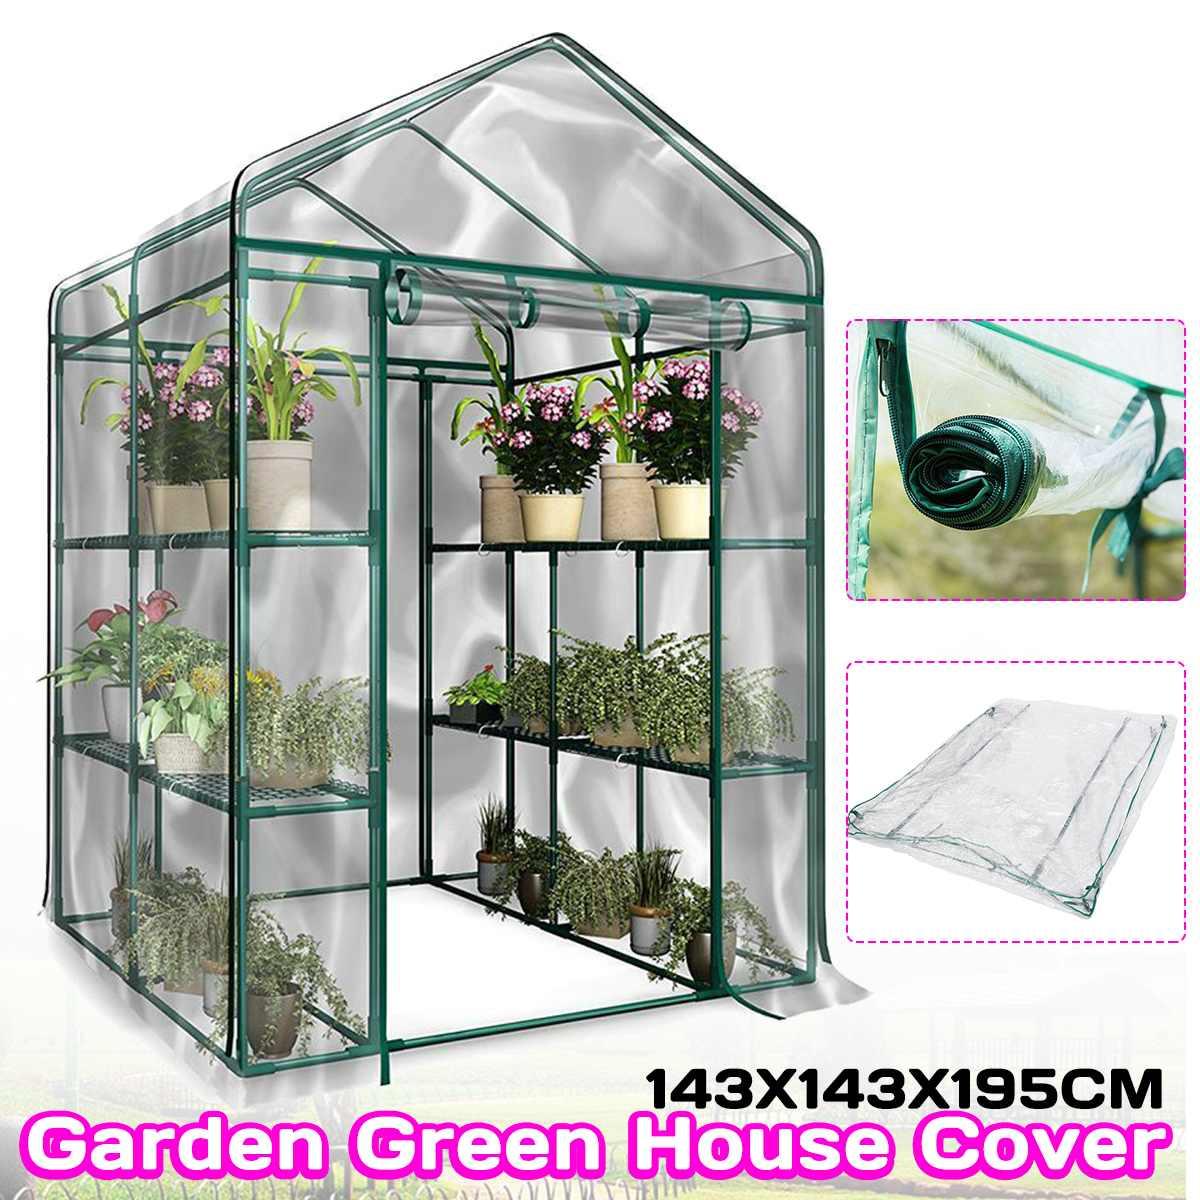 3-Tier Portable Greenhouse 6 Shelves PVC Cover Garden Cover Plants Flower House 143X143X195cm Corrosion-resistant Waterproof